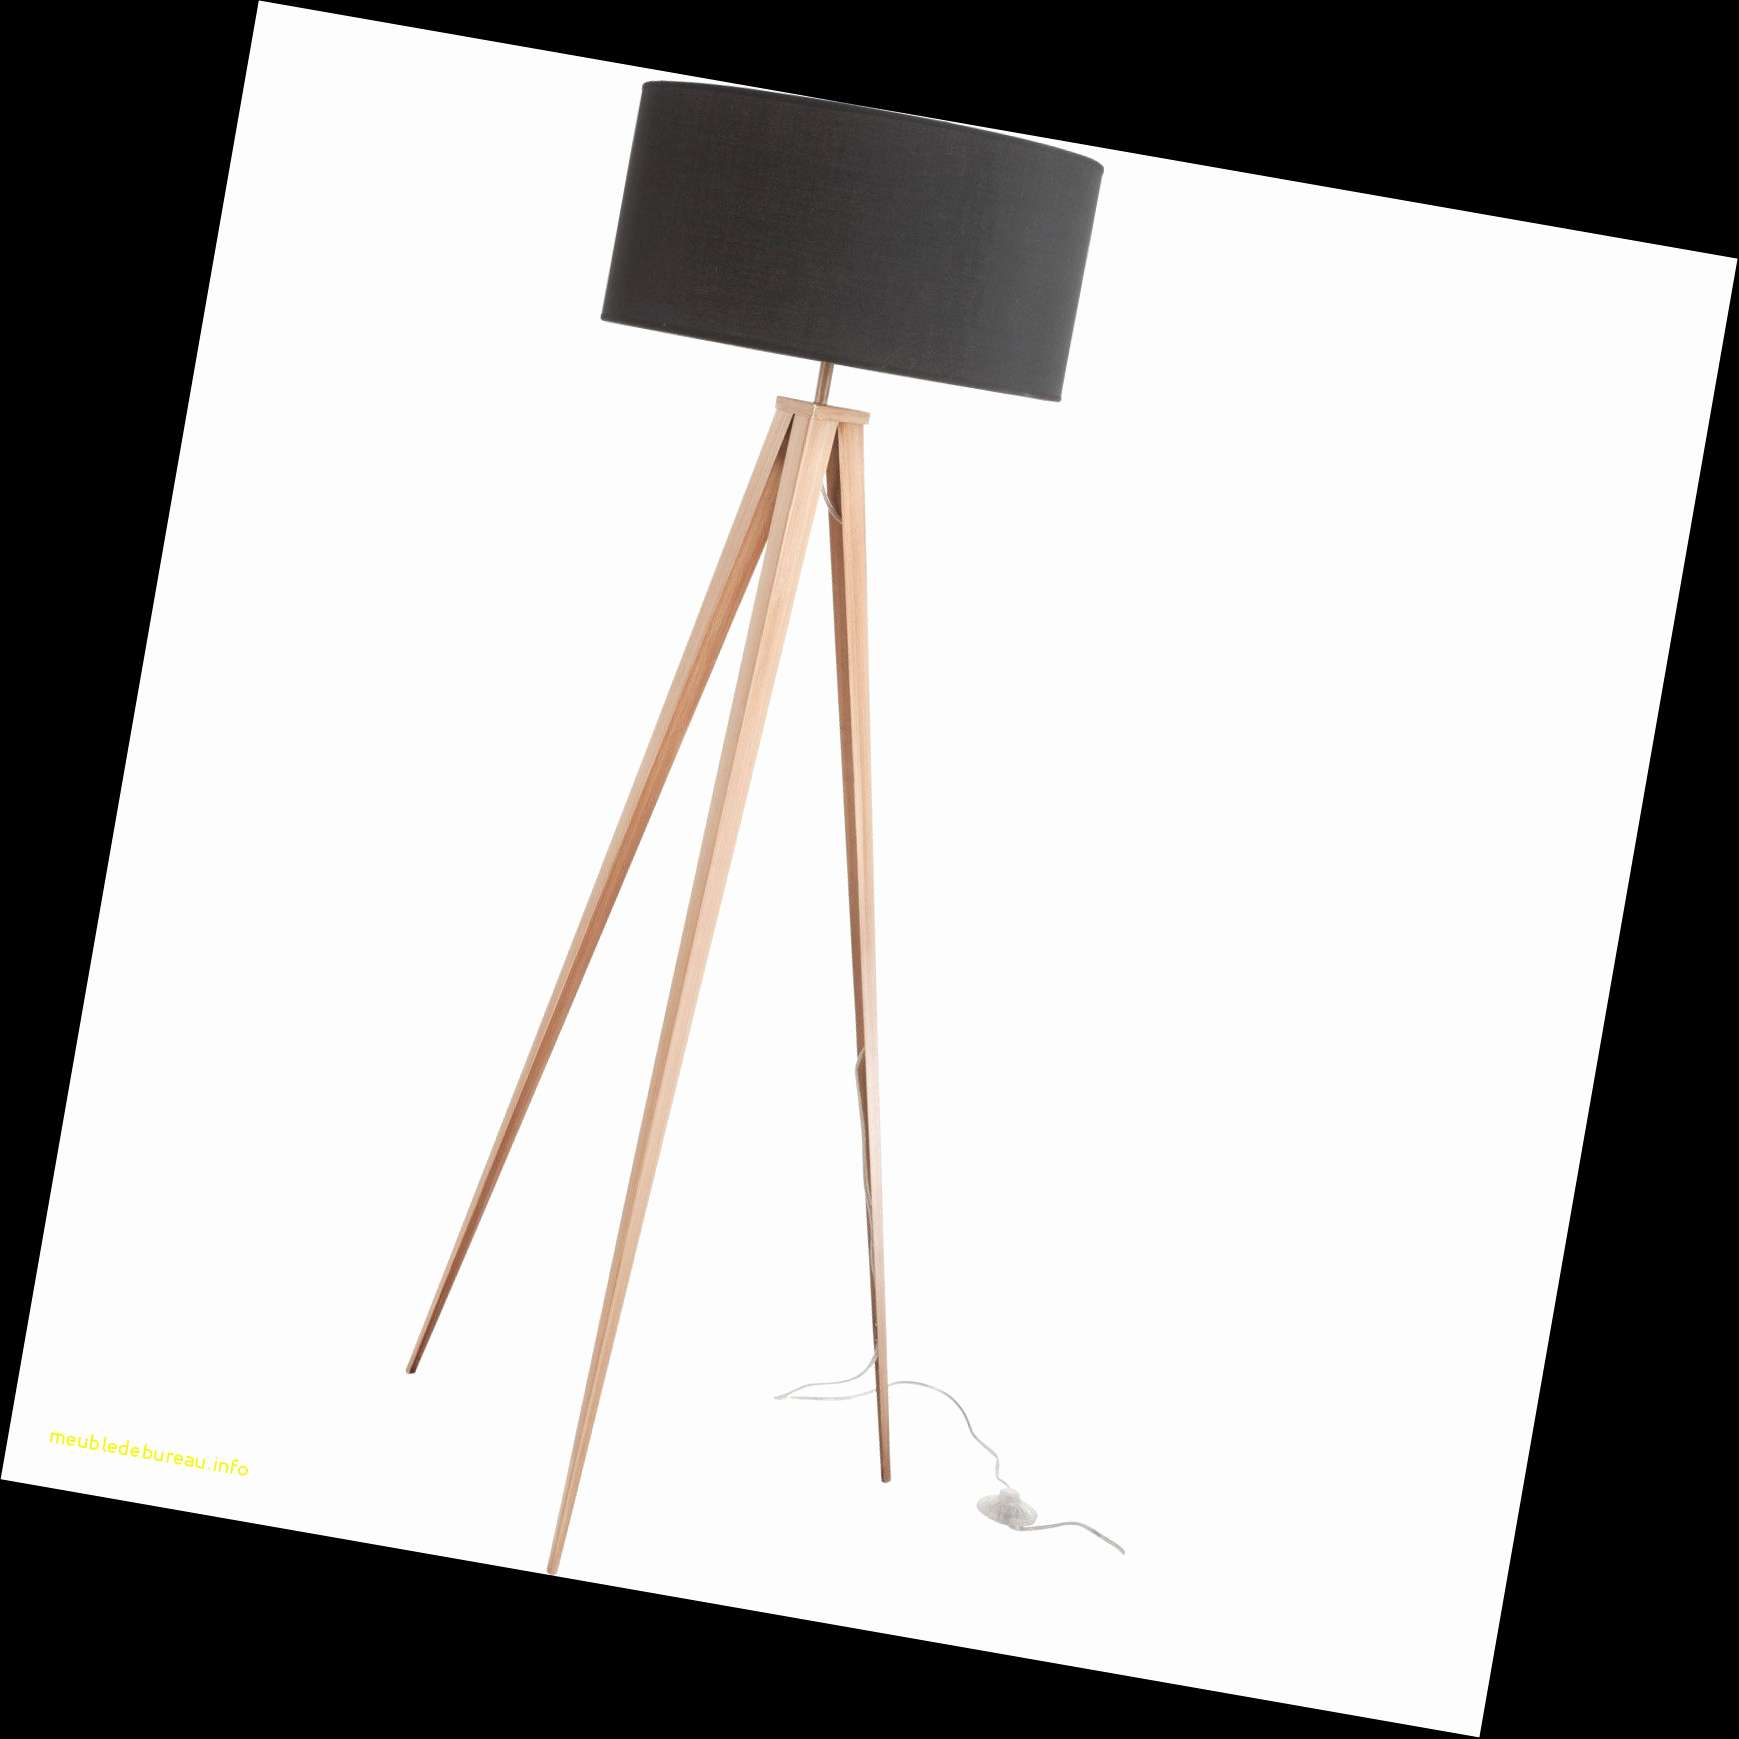 bureau verre trempe luxury plan vasque en verre trempe luxe lampe liseuse sur piedml of bureau verre trempe